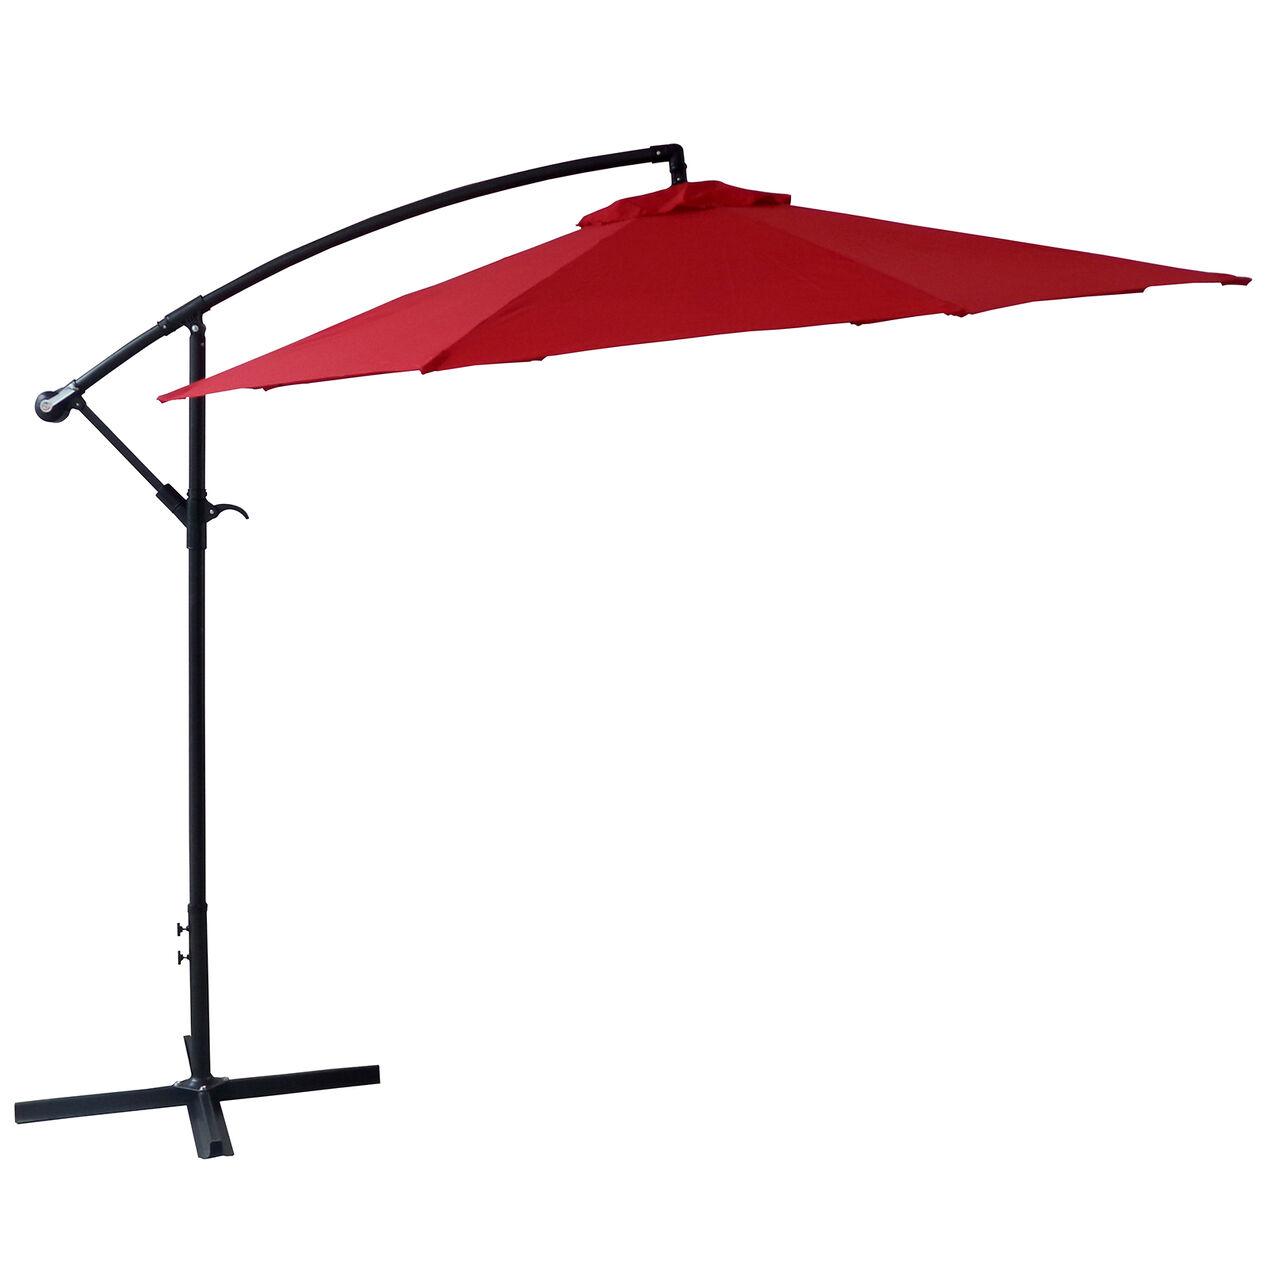 Umbrella covers for patio umbrellas - Offset Red Outdoor Umbrella 10 Ft